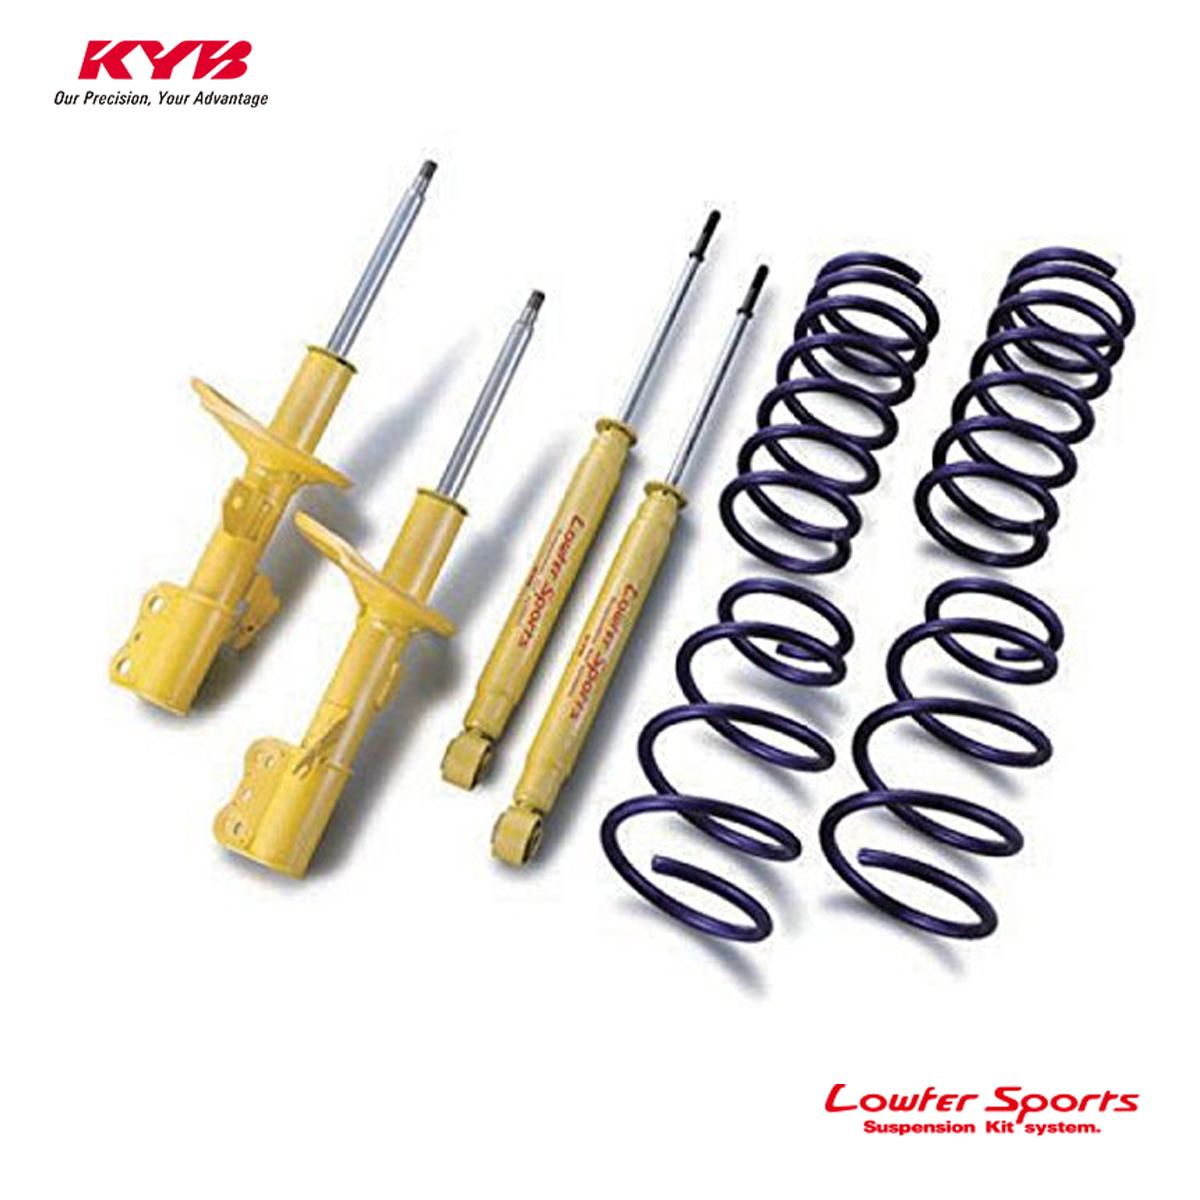 KYB カヤバ CX-5 KE2FW ショックアブソーバー サスペンションキット 1台分 ローファースポーツ キット Lowfer Sports LKIT-KE2FW9